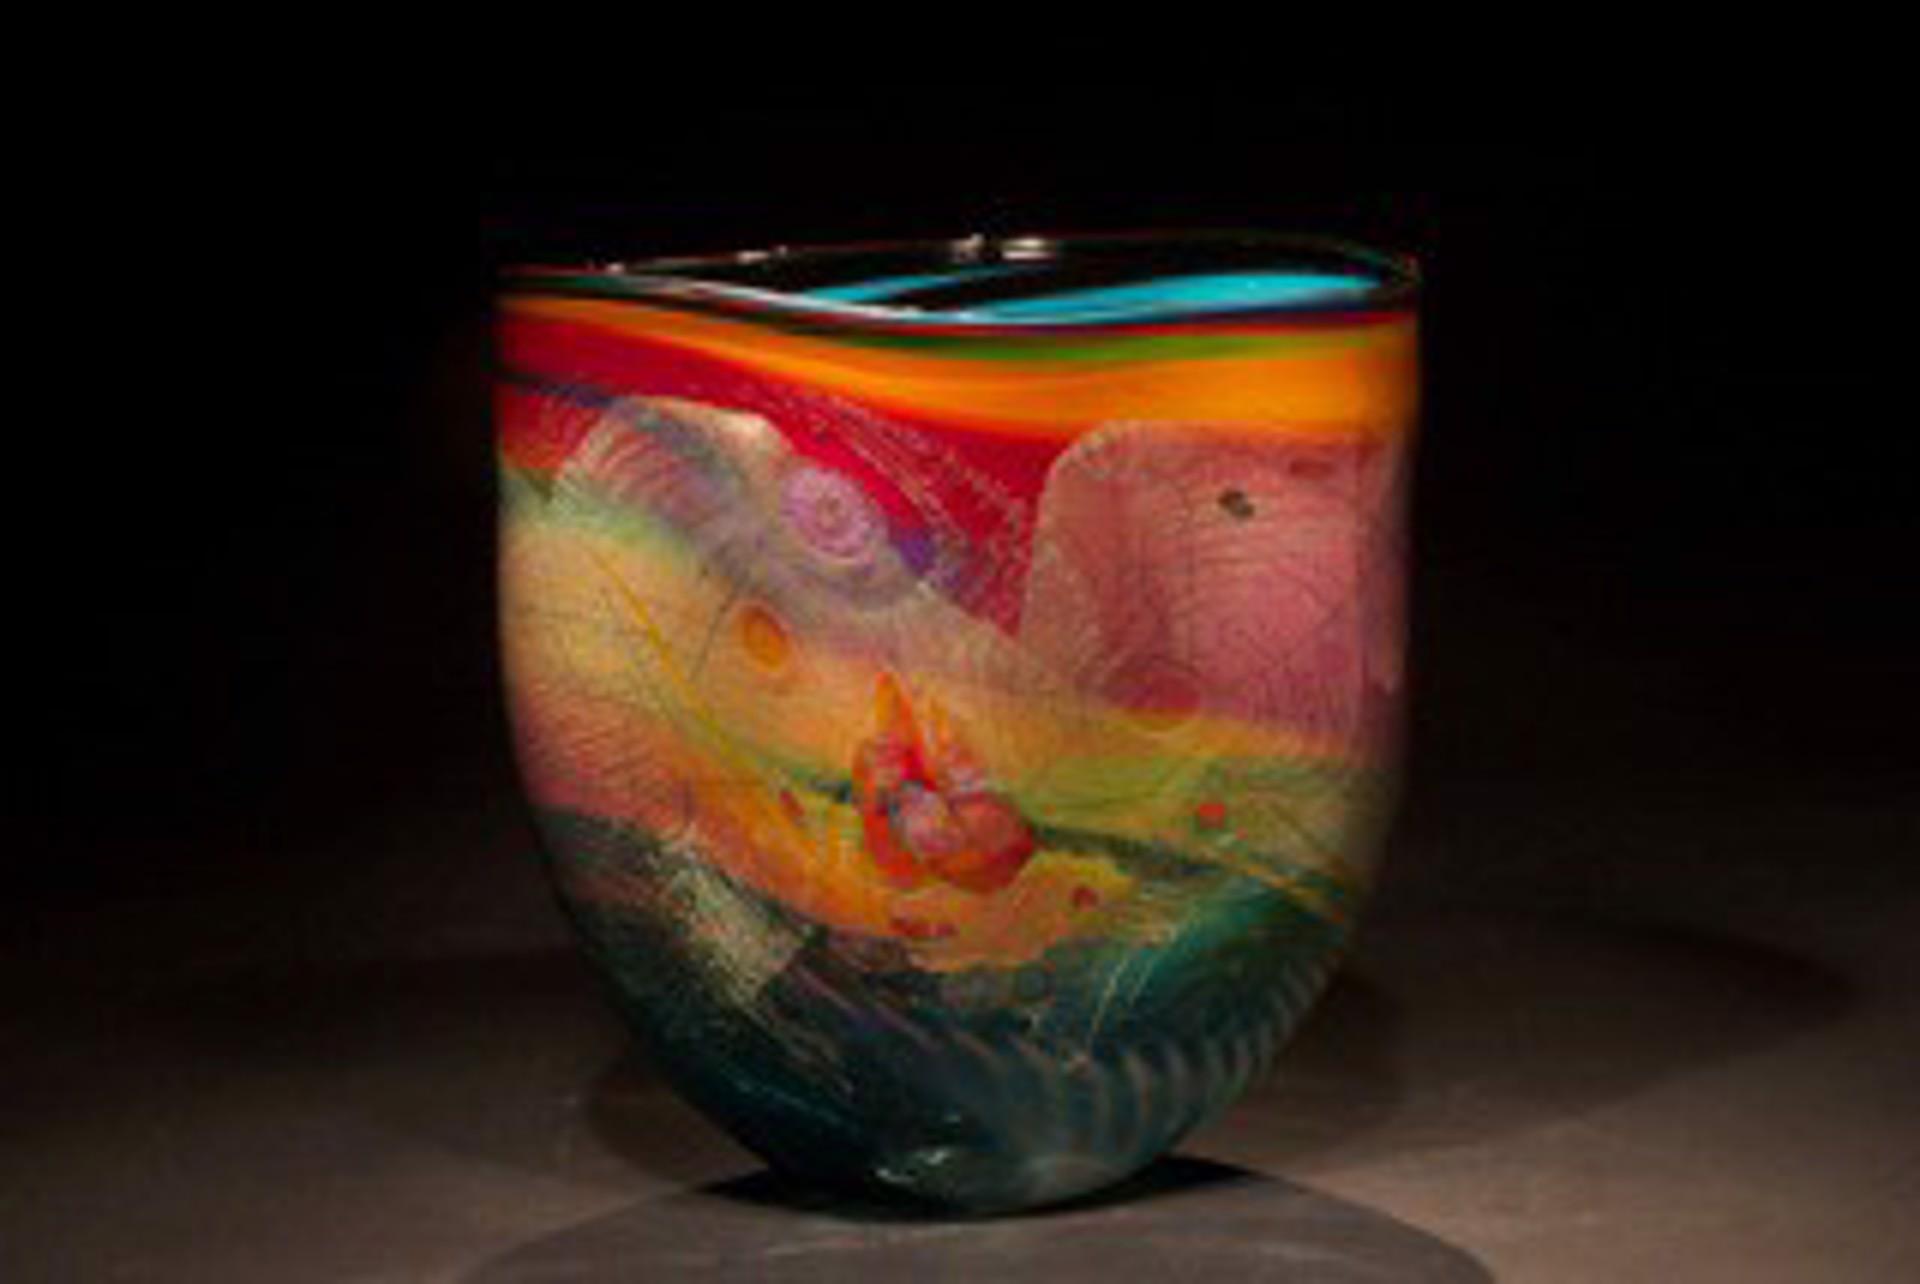 Sunset Vase by Chris Hawthorne